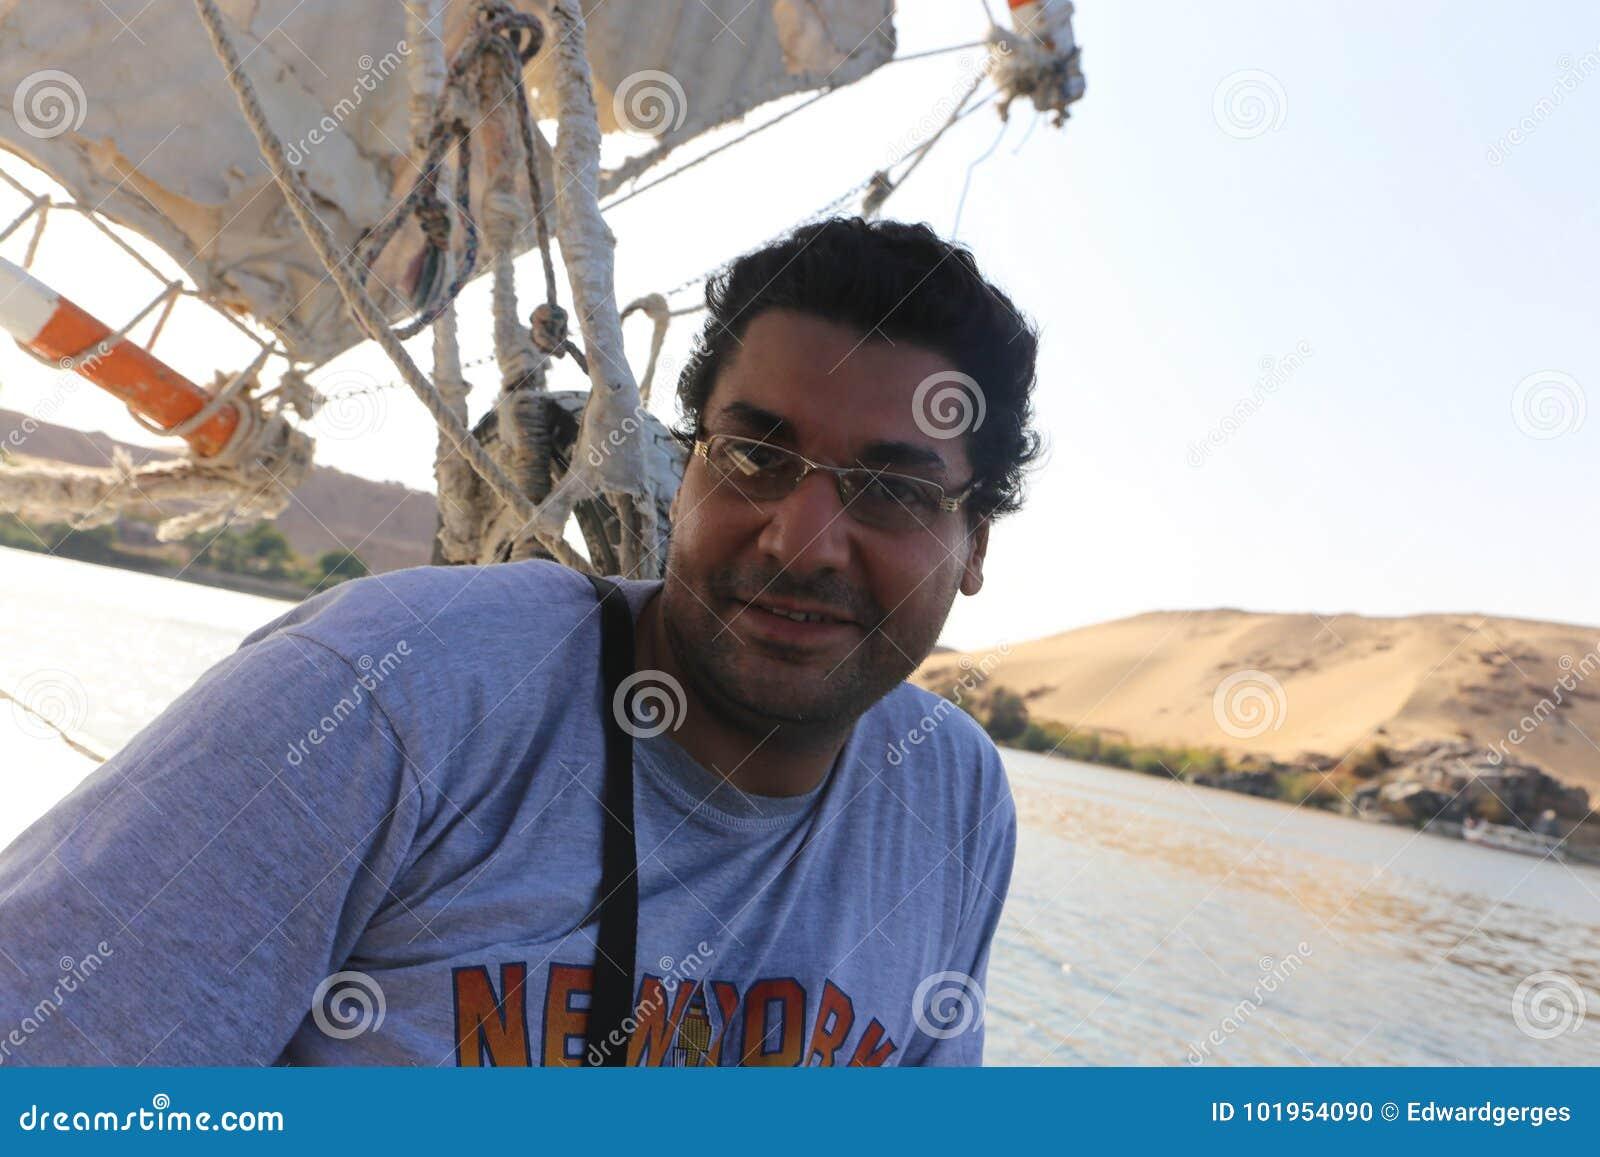 Egyptian man on boat